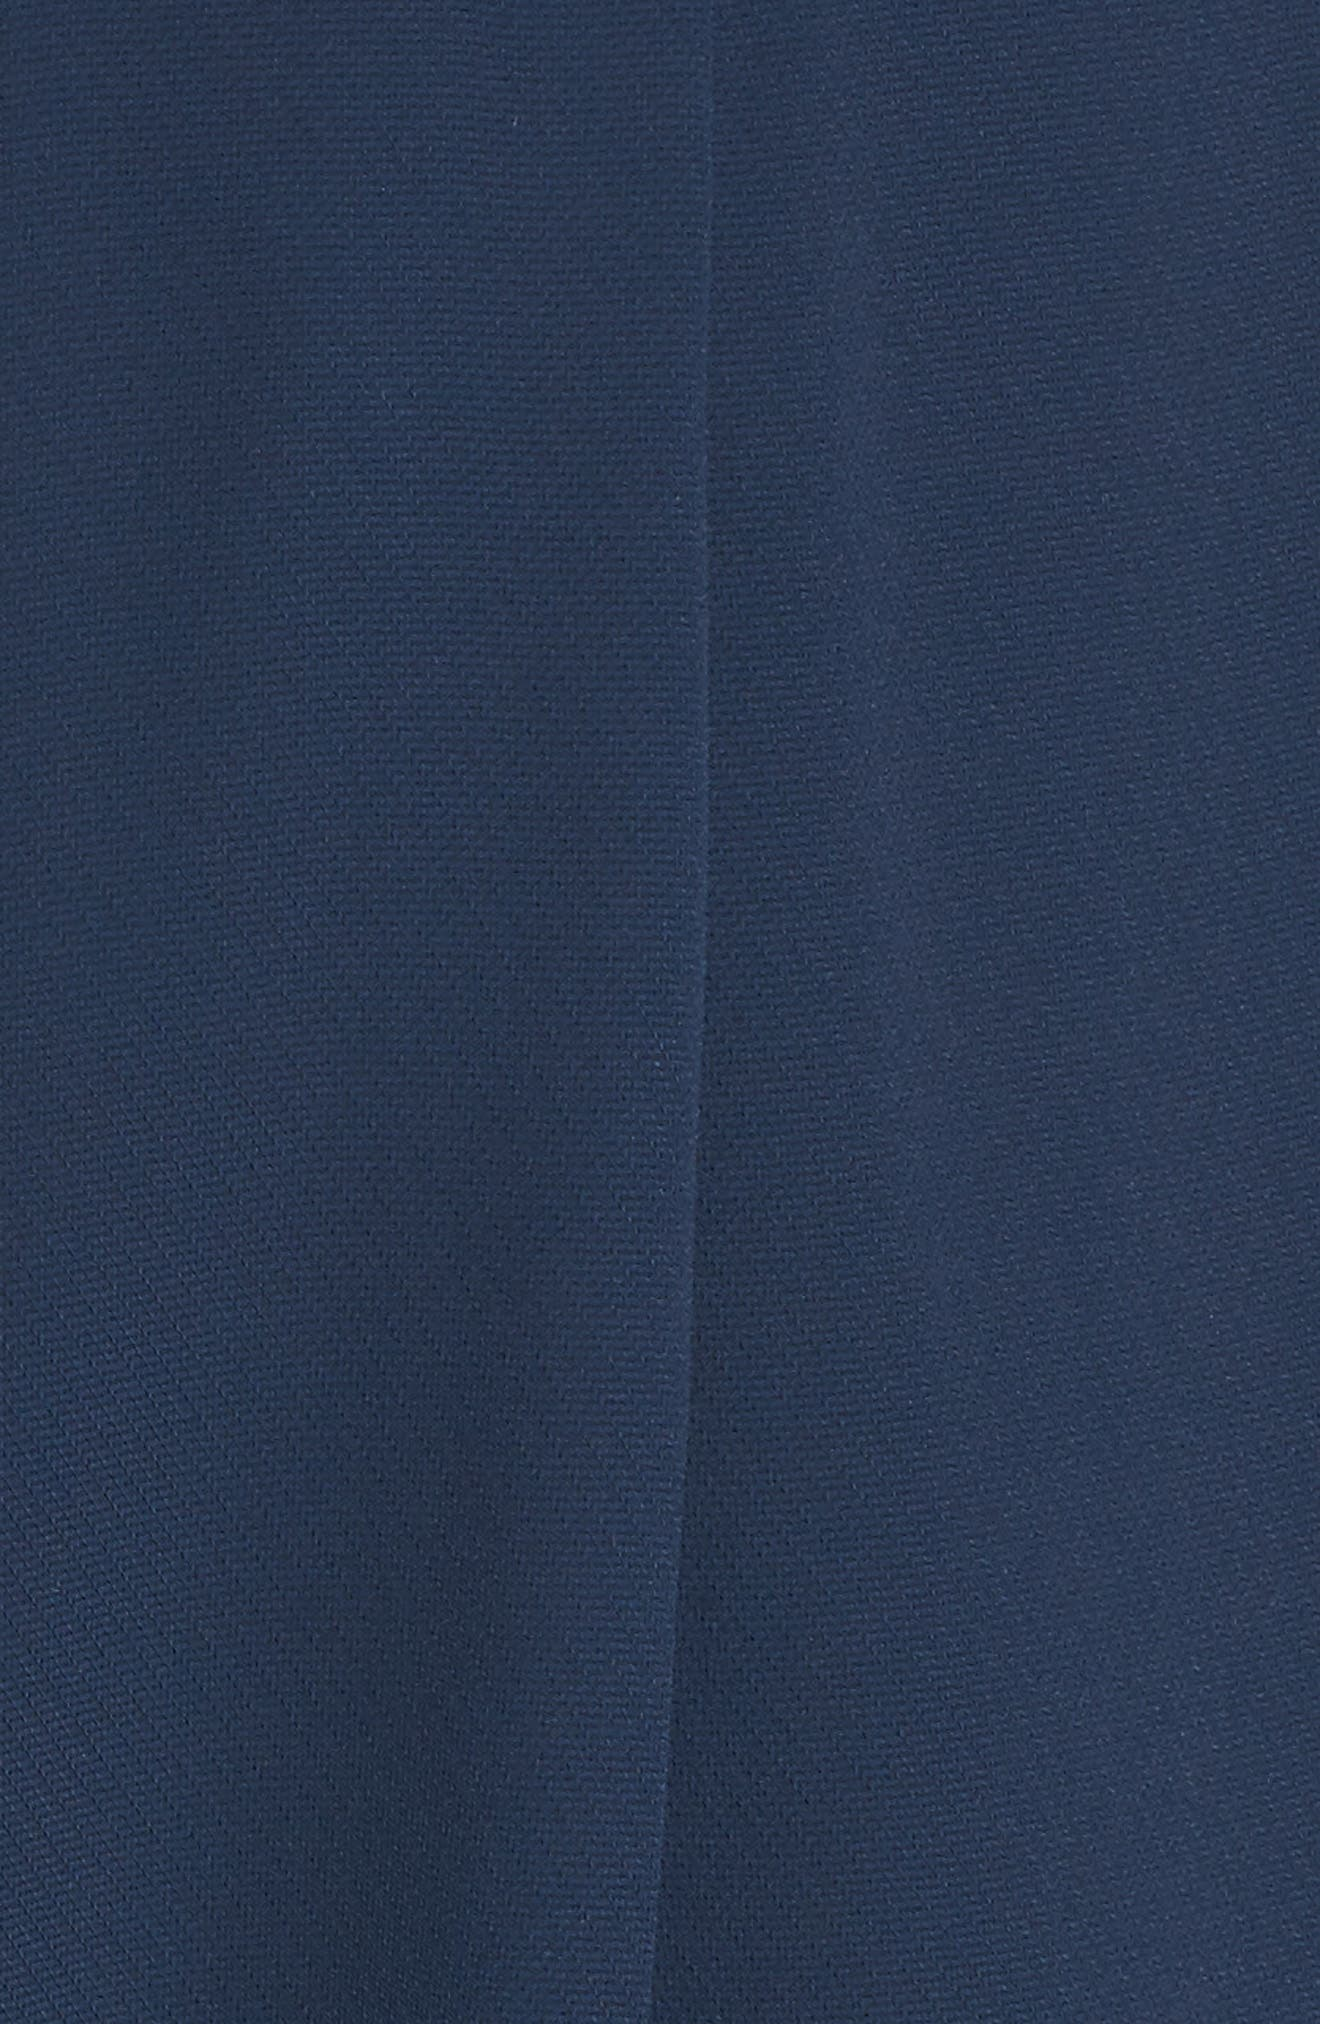 Evening Light Drape Dress,                             Alternate thumbnail 5, color,                             Iron Navy